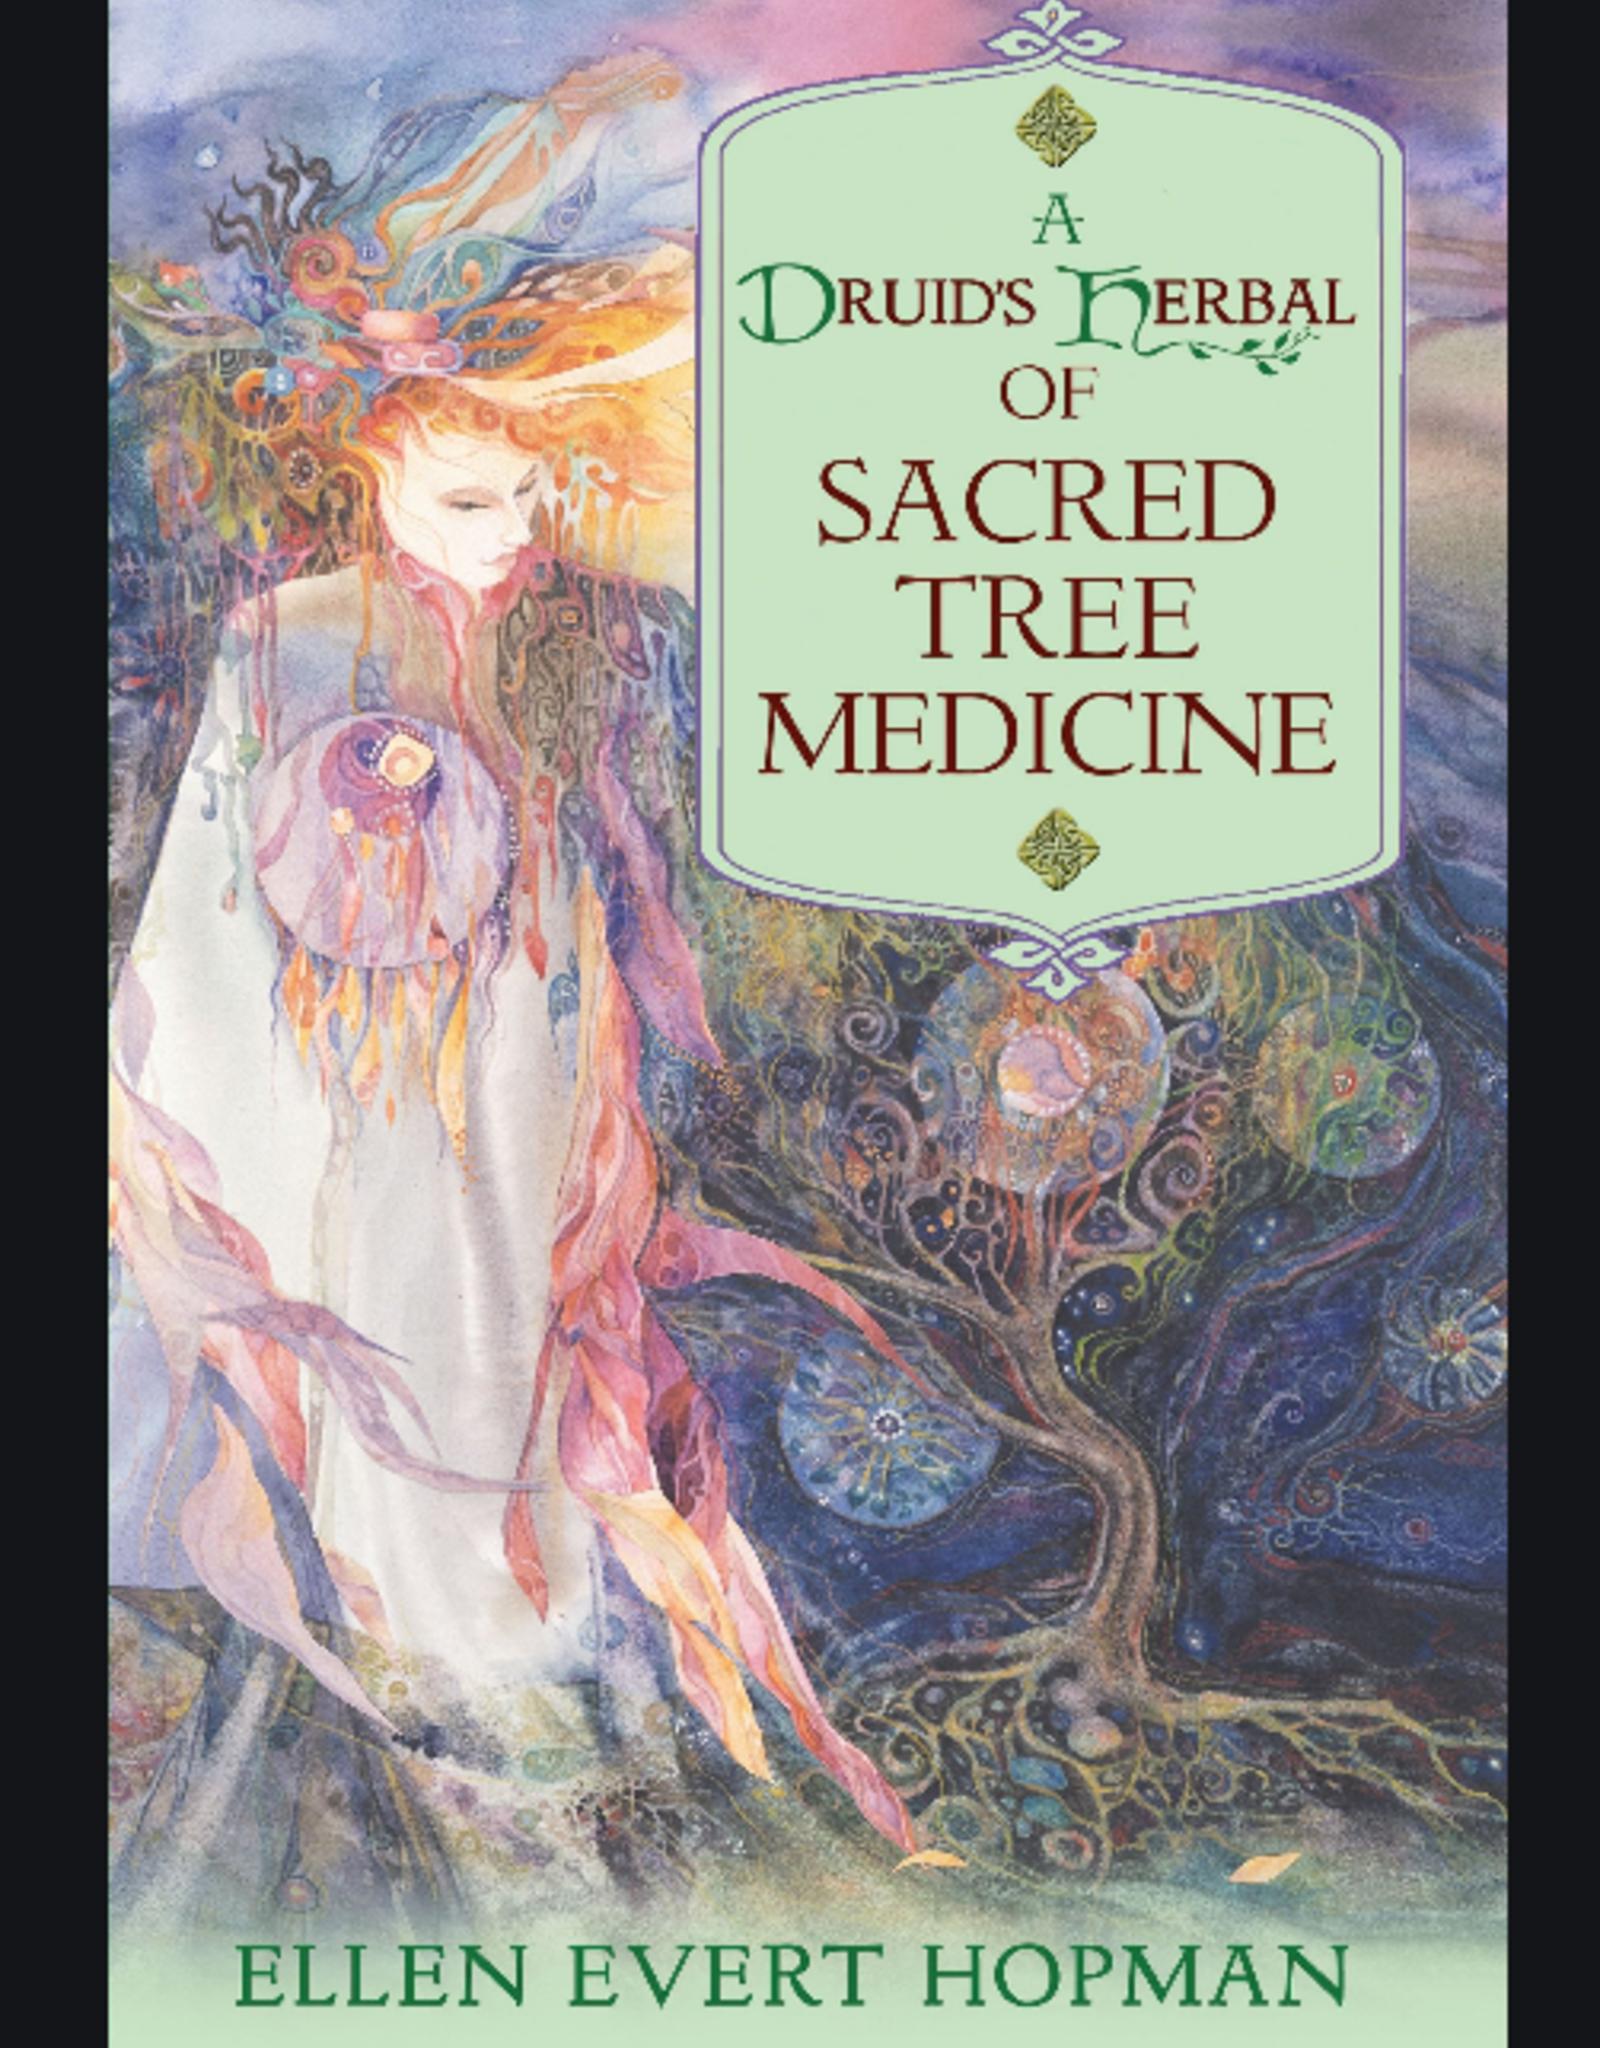 Ellen Evert Hopman A Druid's Herbal of Sacred Tree Medicine by Ellen Evert Hopman